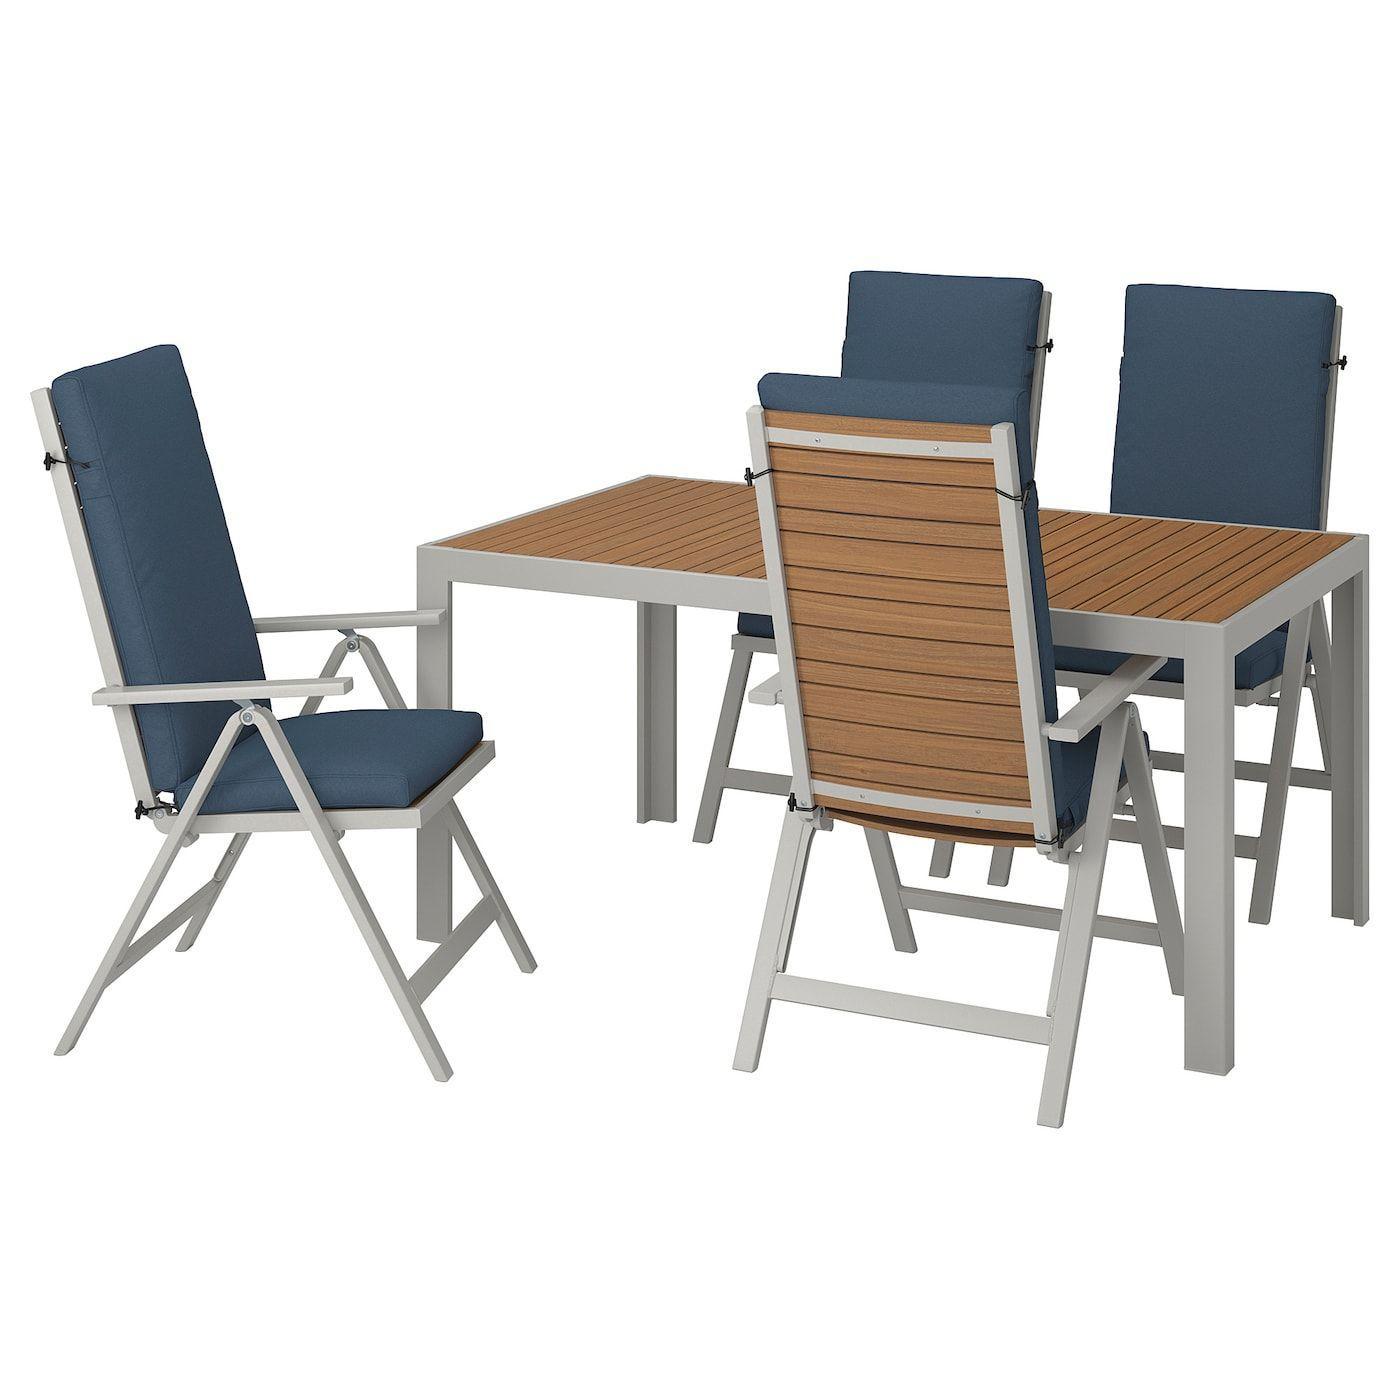 Ikea Gartenstuhl Hochlehner